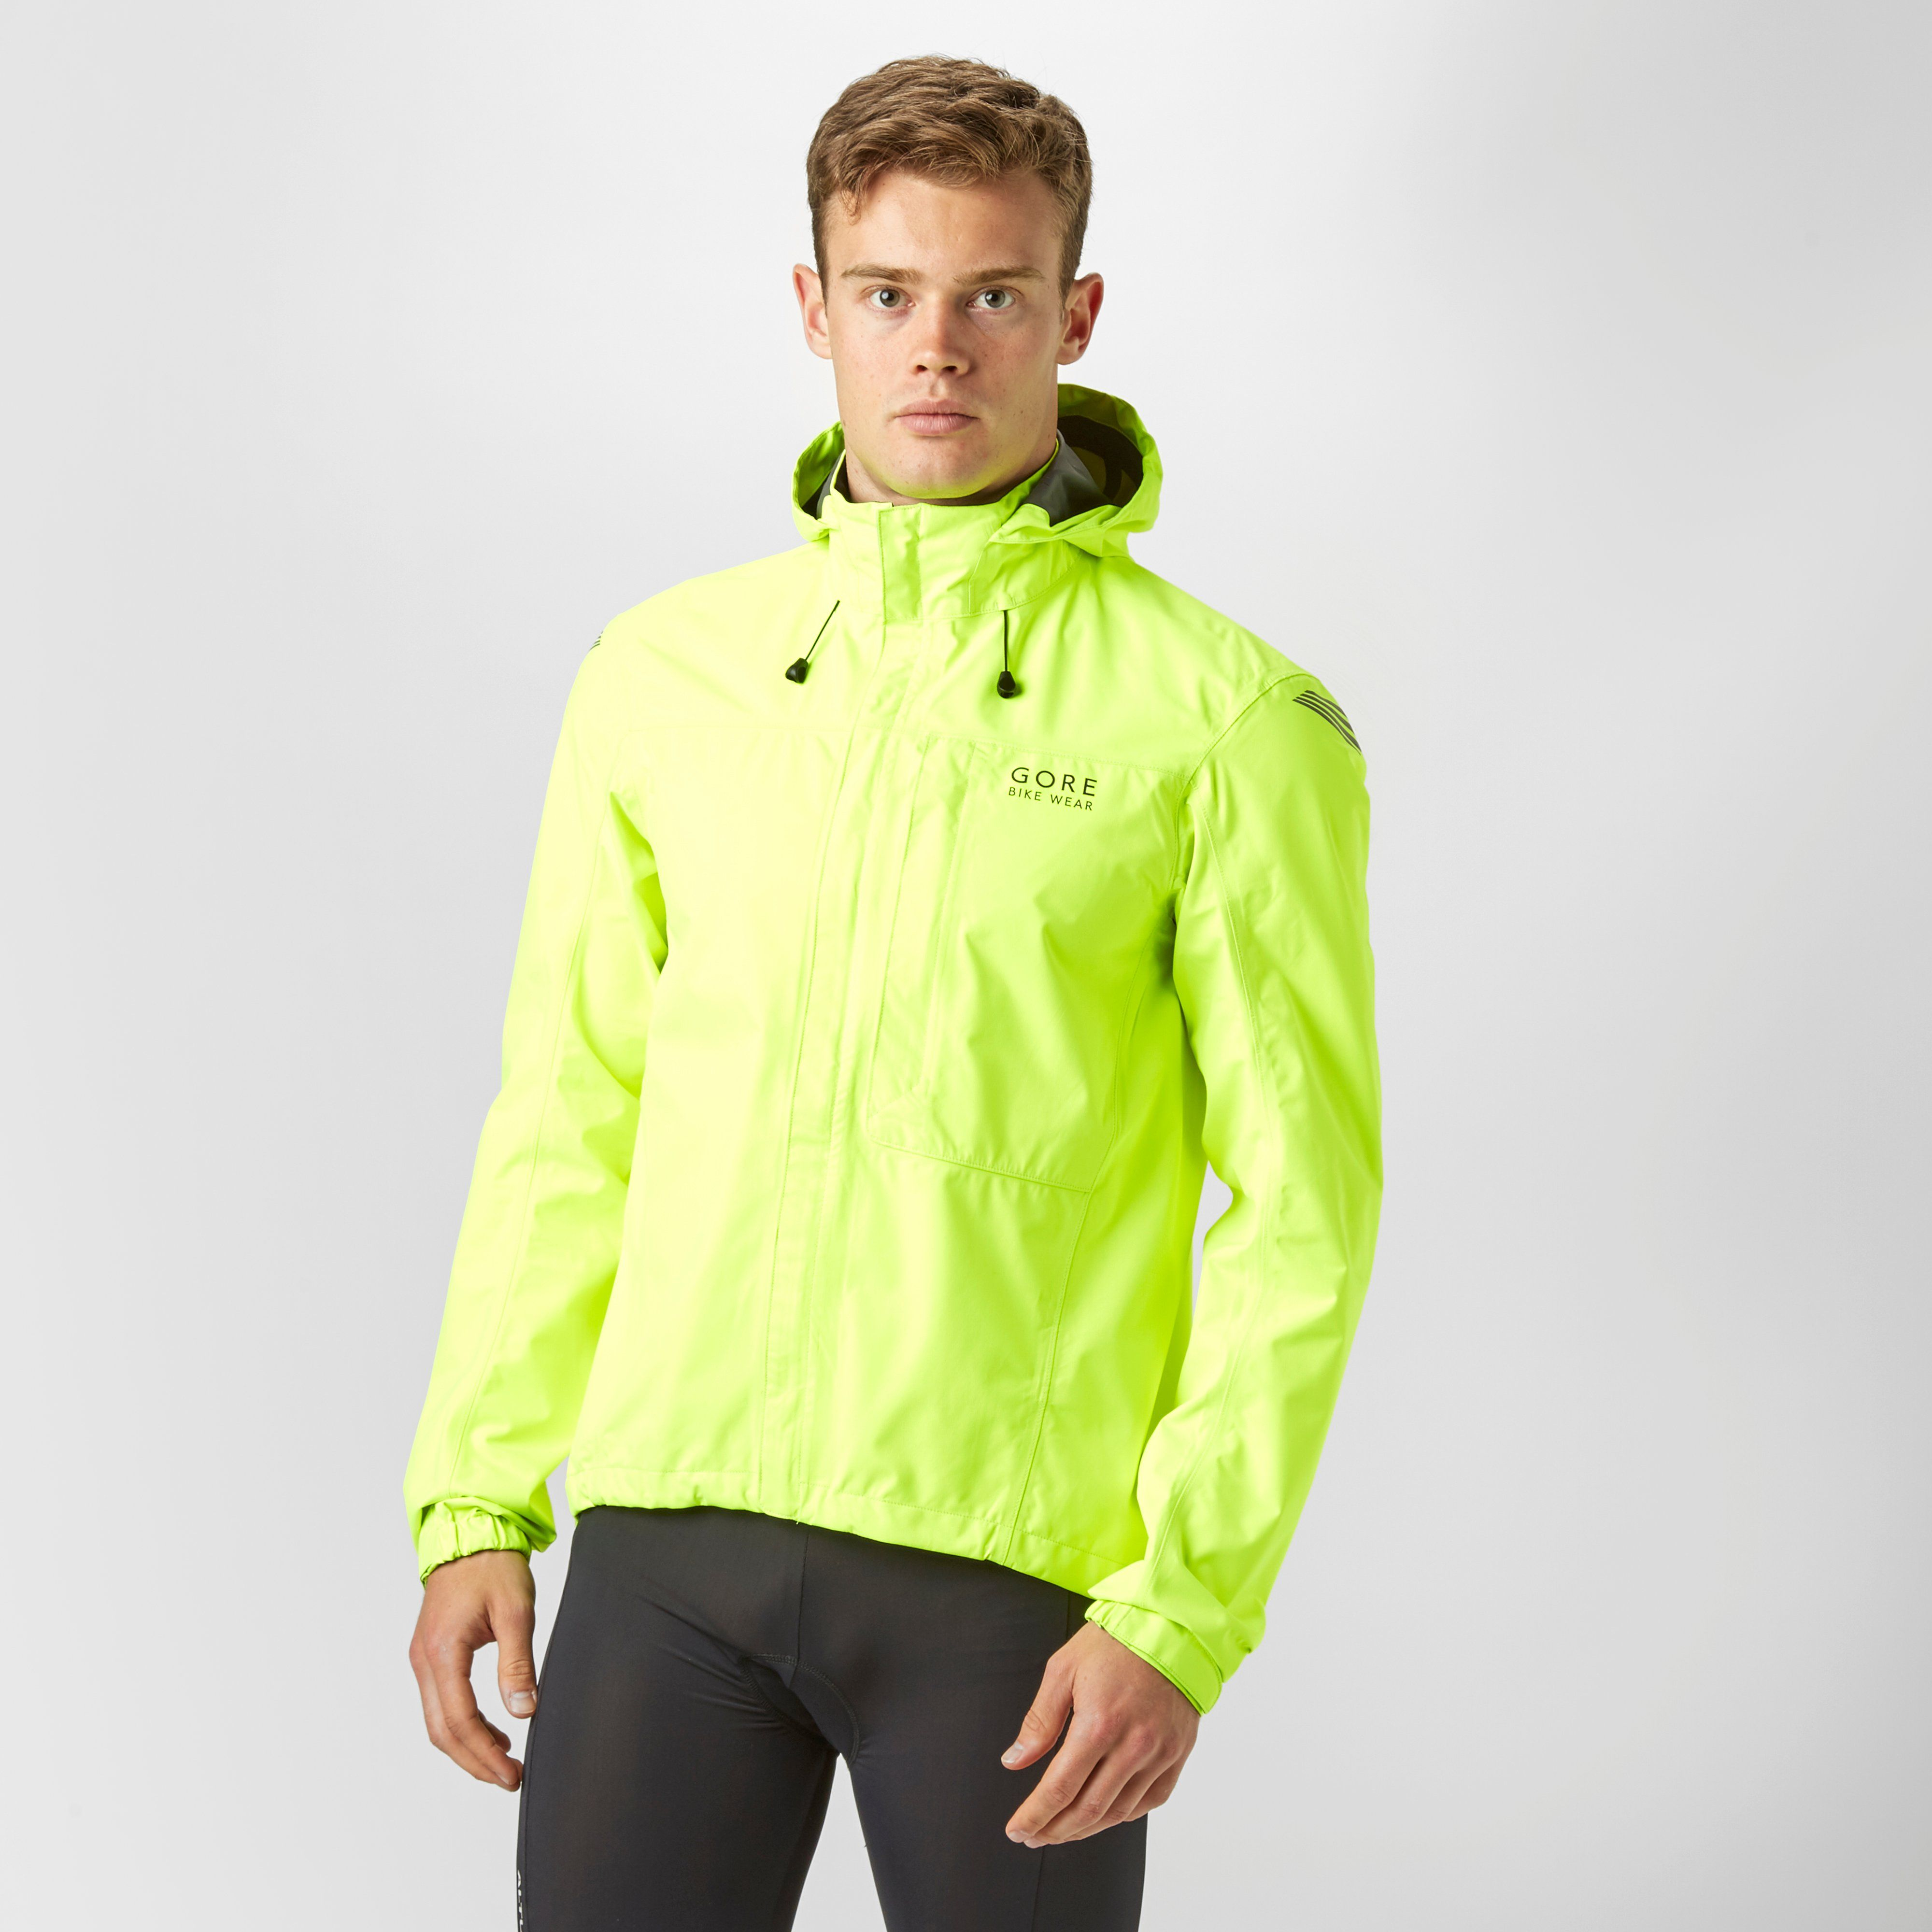 GORE Men's GORE-TEX® Paclite Jacket